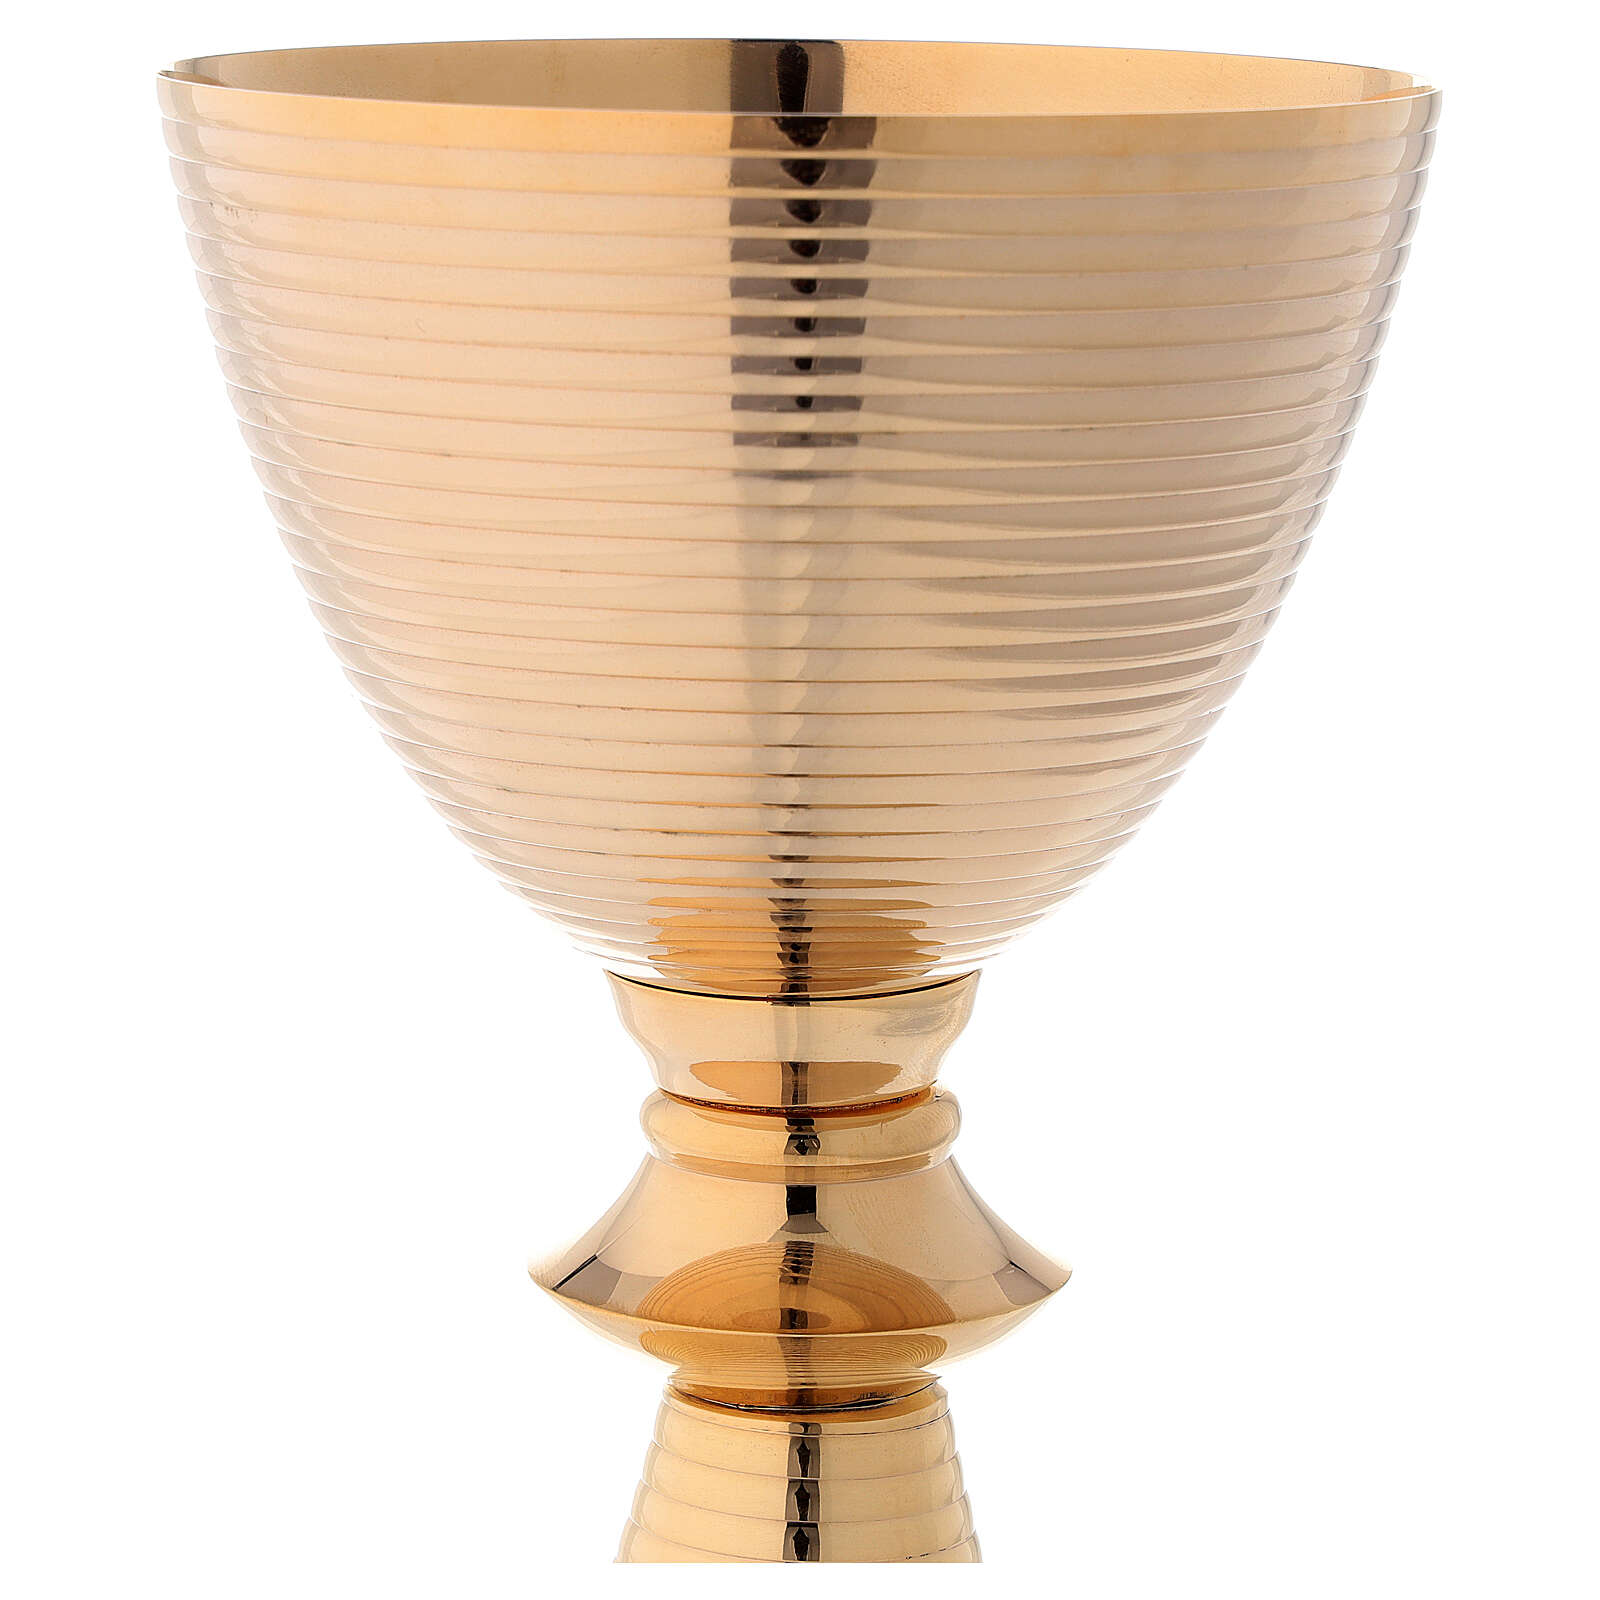 Cáliz y patena motivo rayas latón dorado 21 cm 4